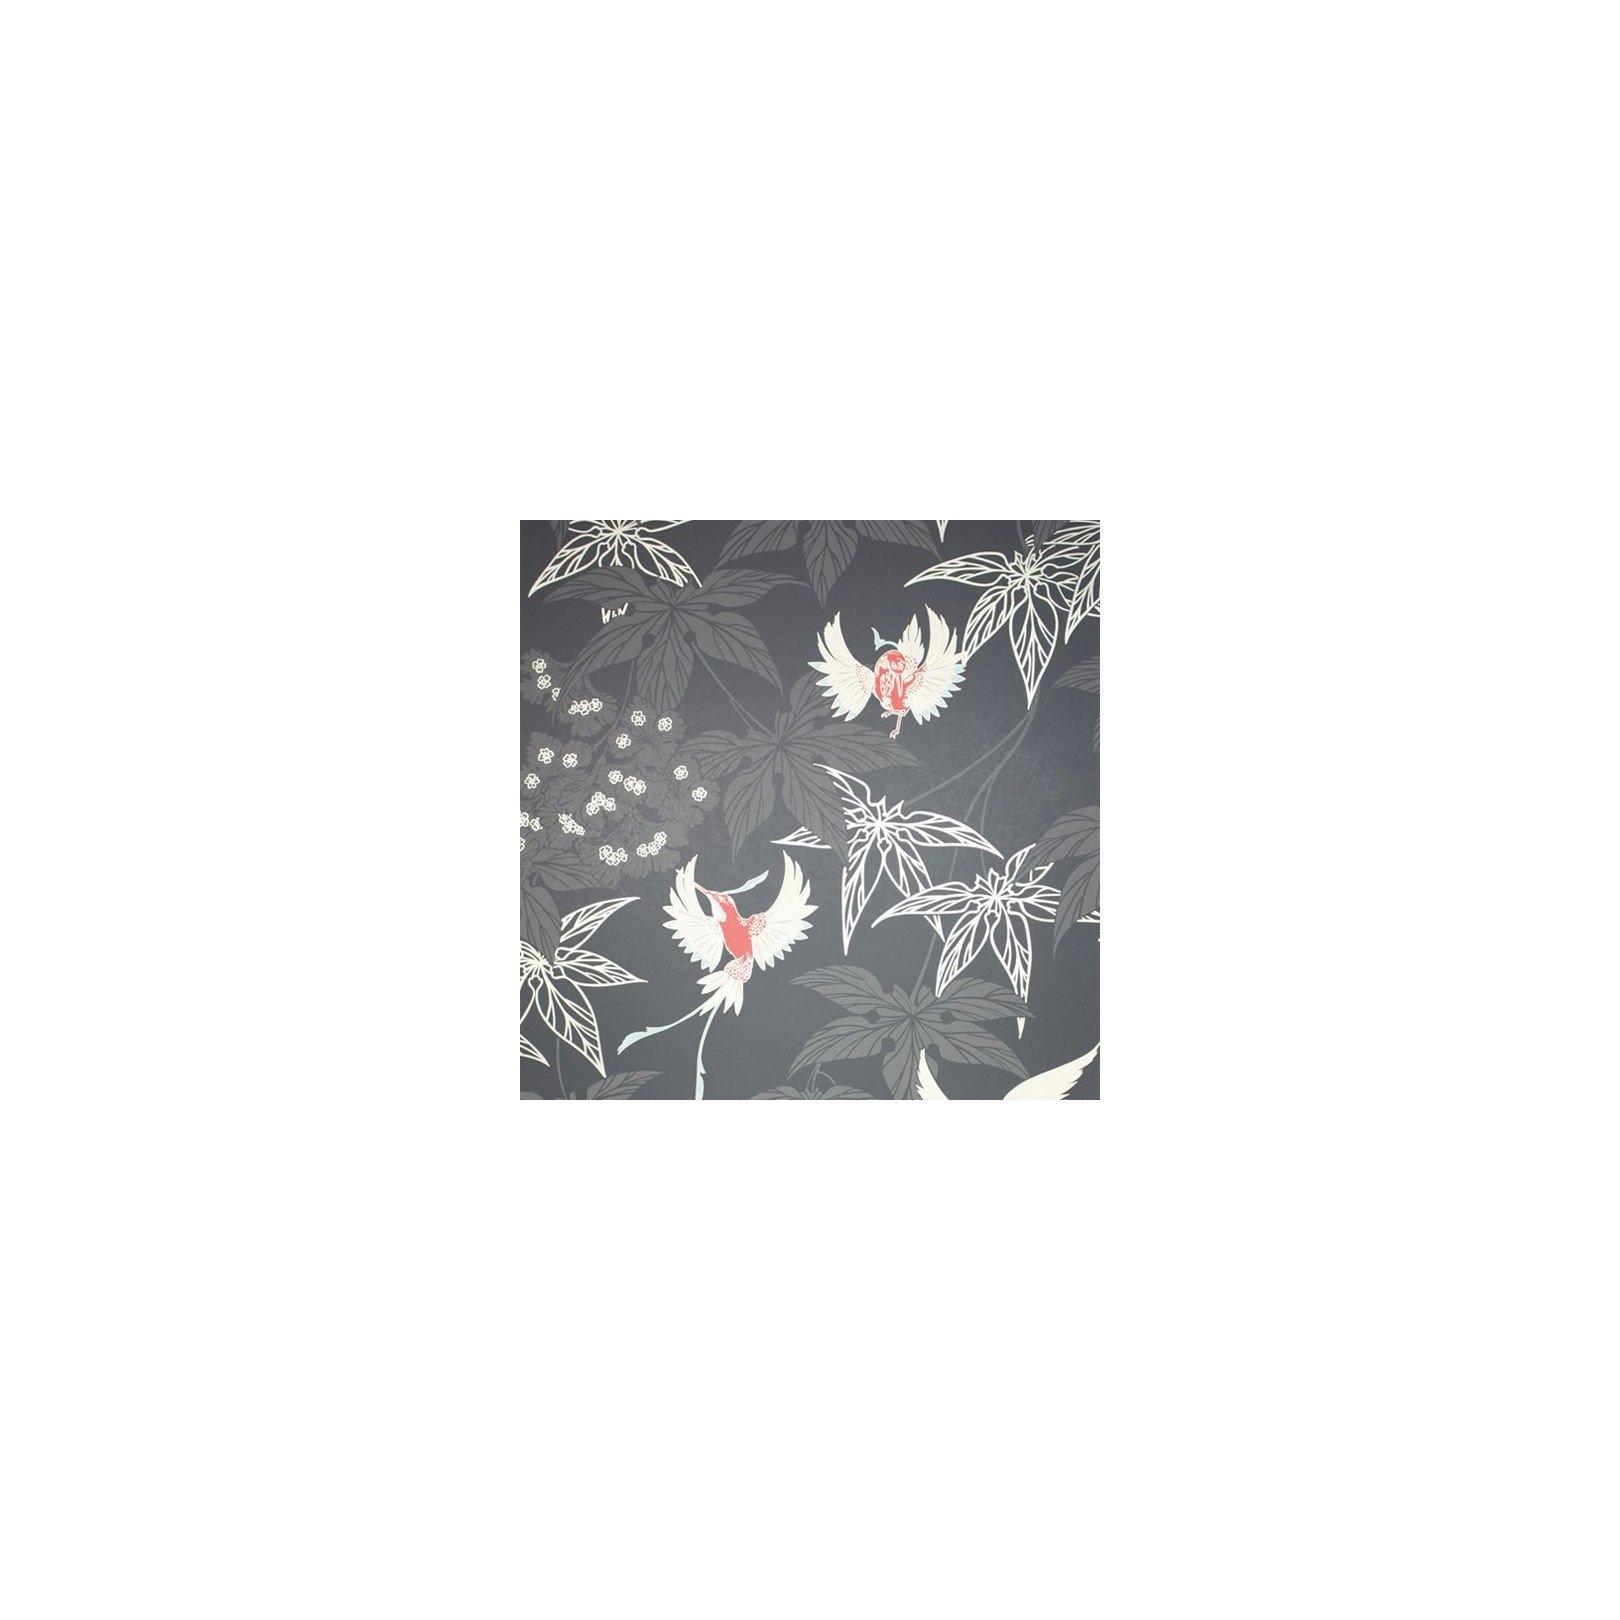 Papier Peint Oiseaux Noir Grove Garden Osborne Little Au Fil